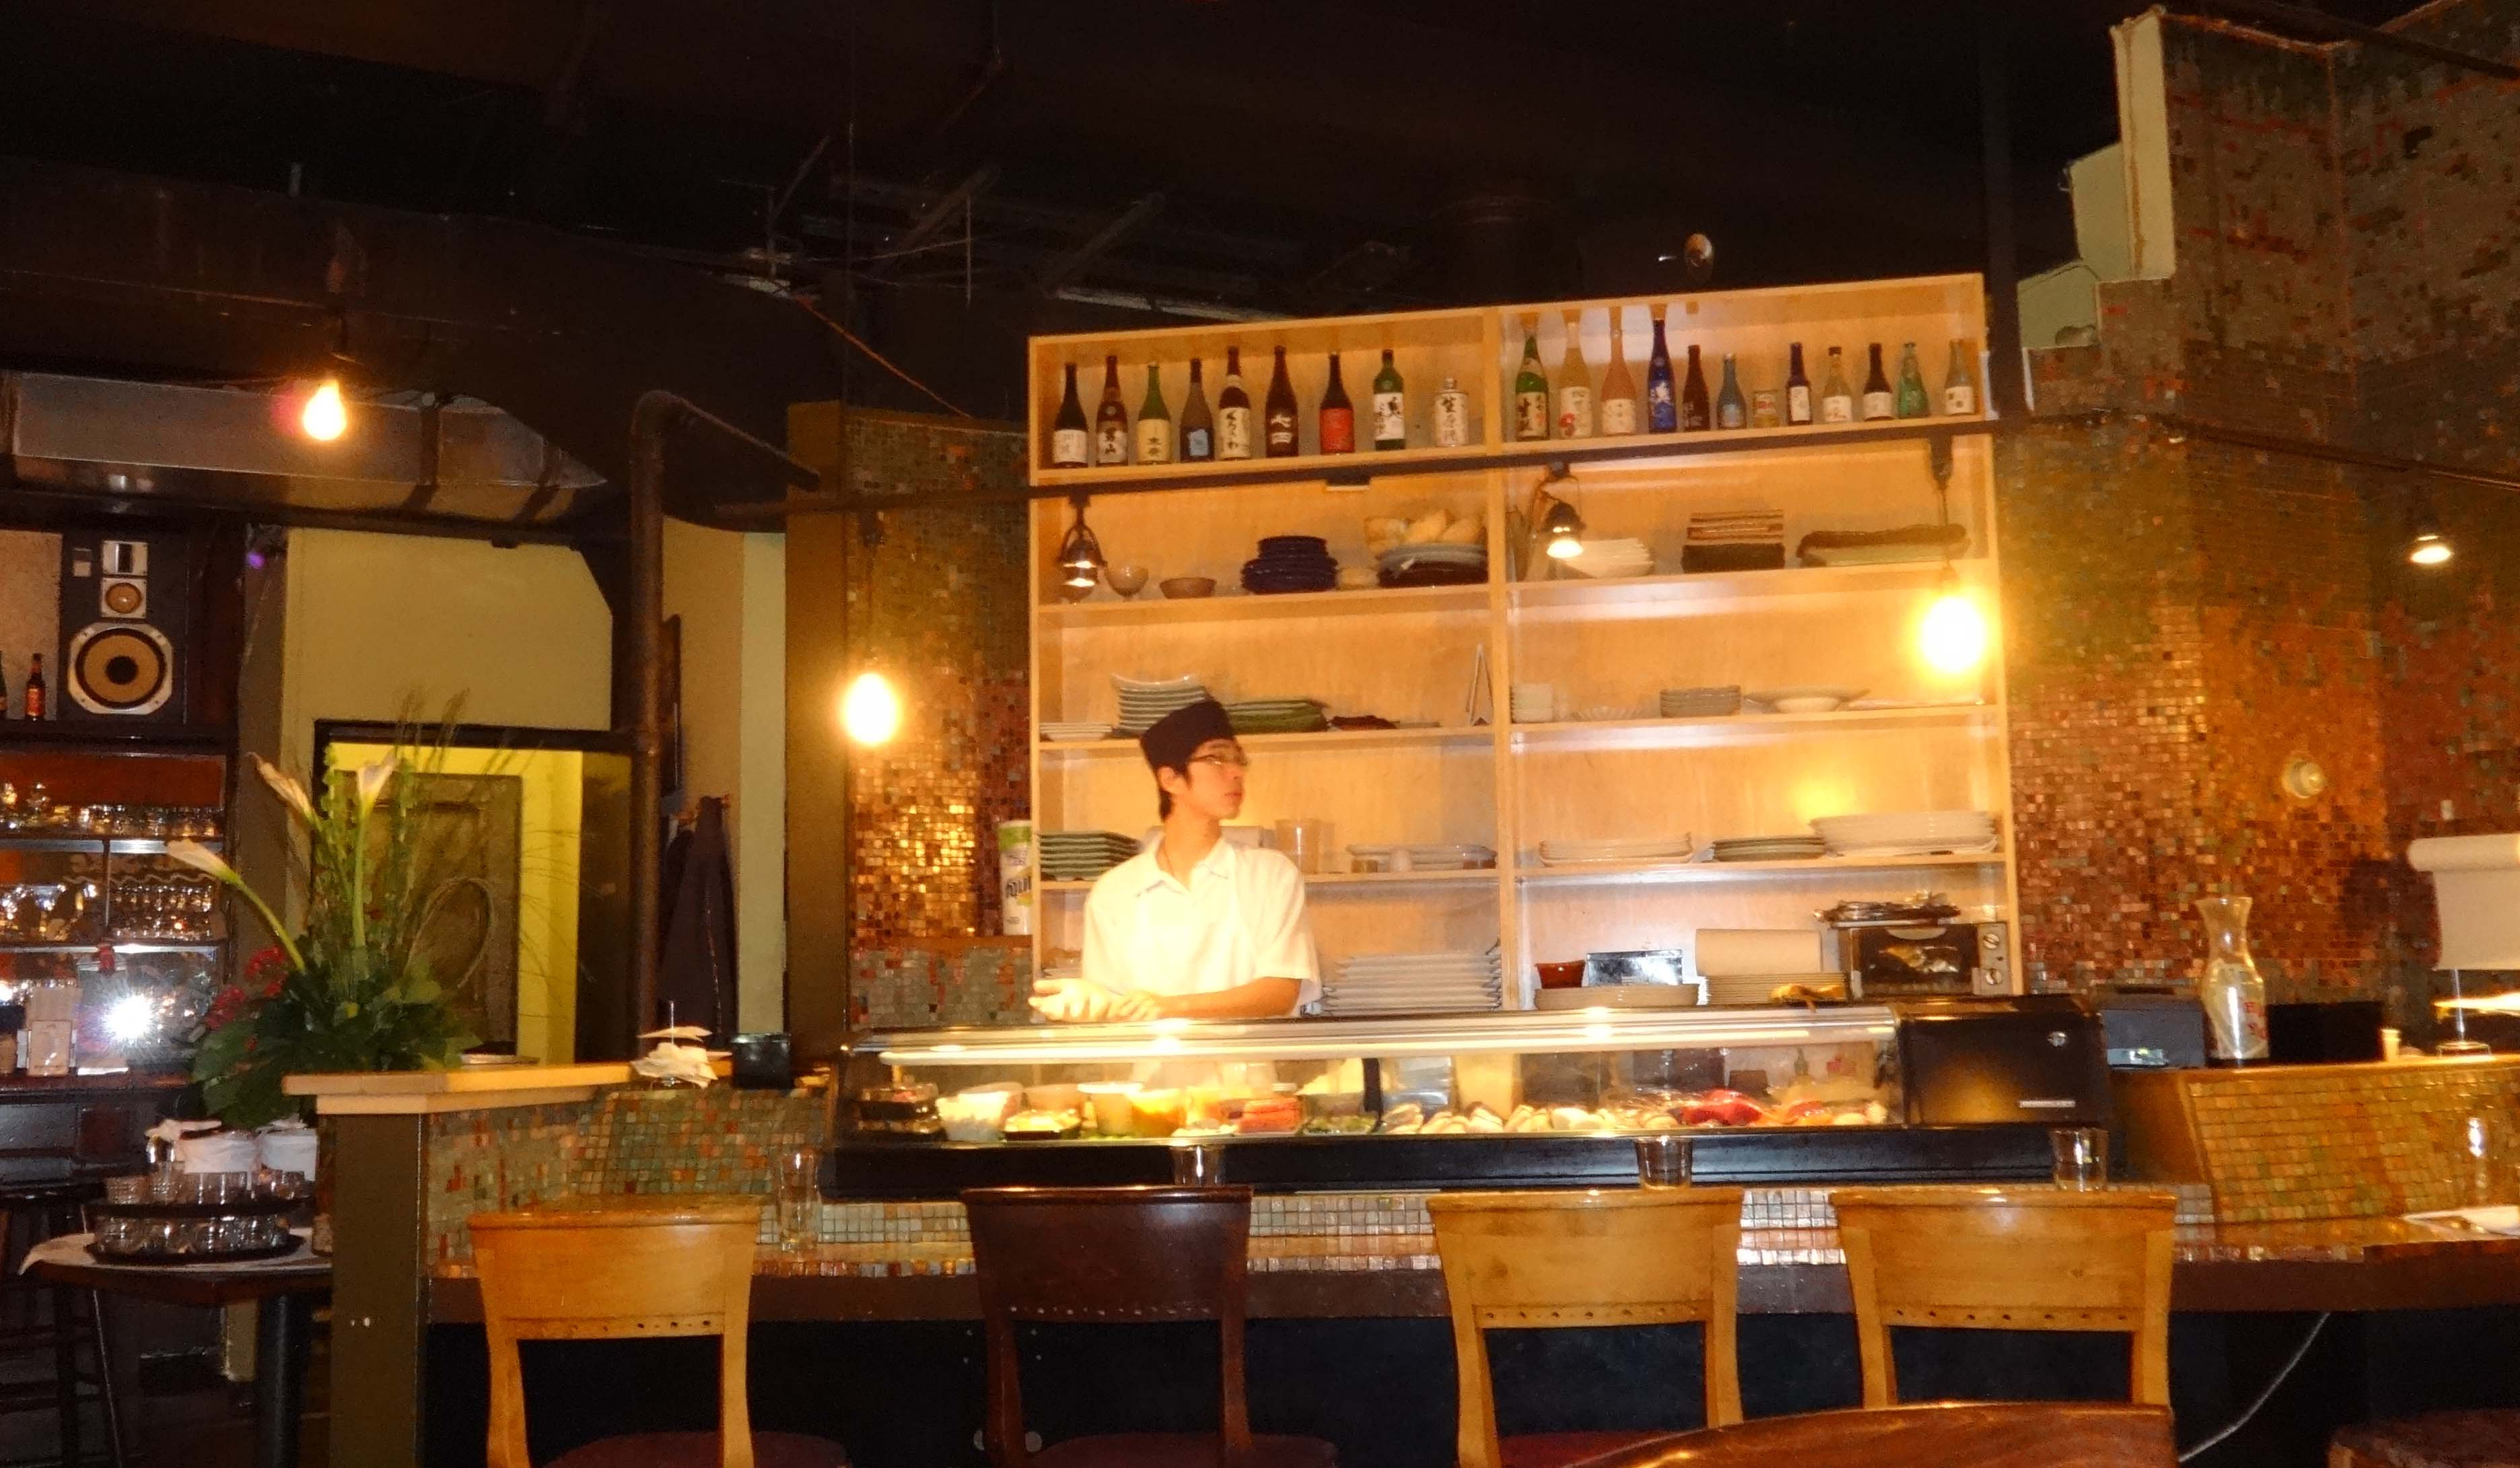 Zutto sushi bar